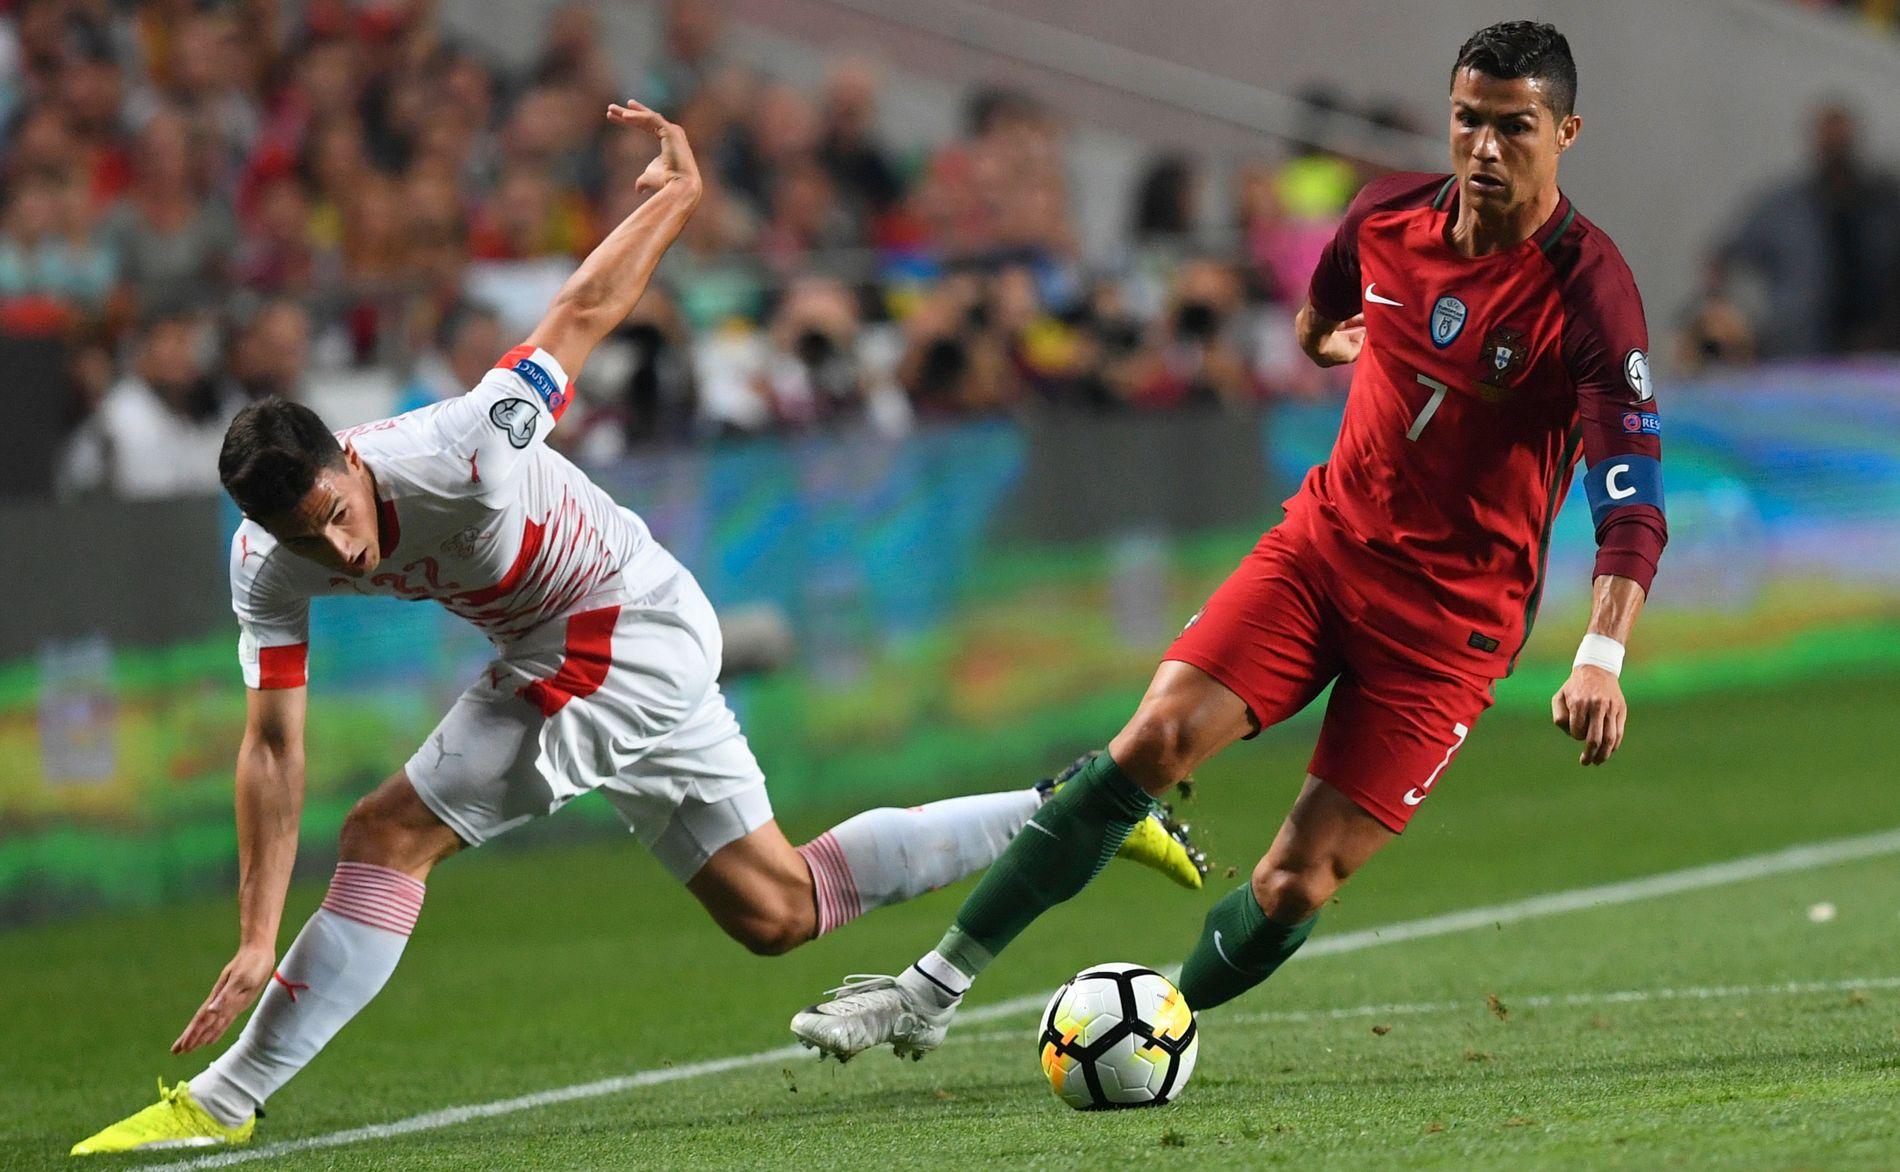 OPS! Cristiano Ronaldo sender Sveits' forsvarsspiller Fabien Schar ut av banen i den avgjørende kvalik-kampen i Lisboa tirsdag.